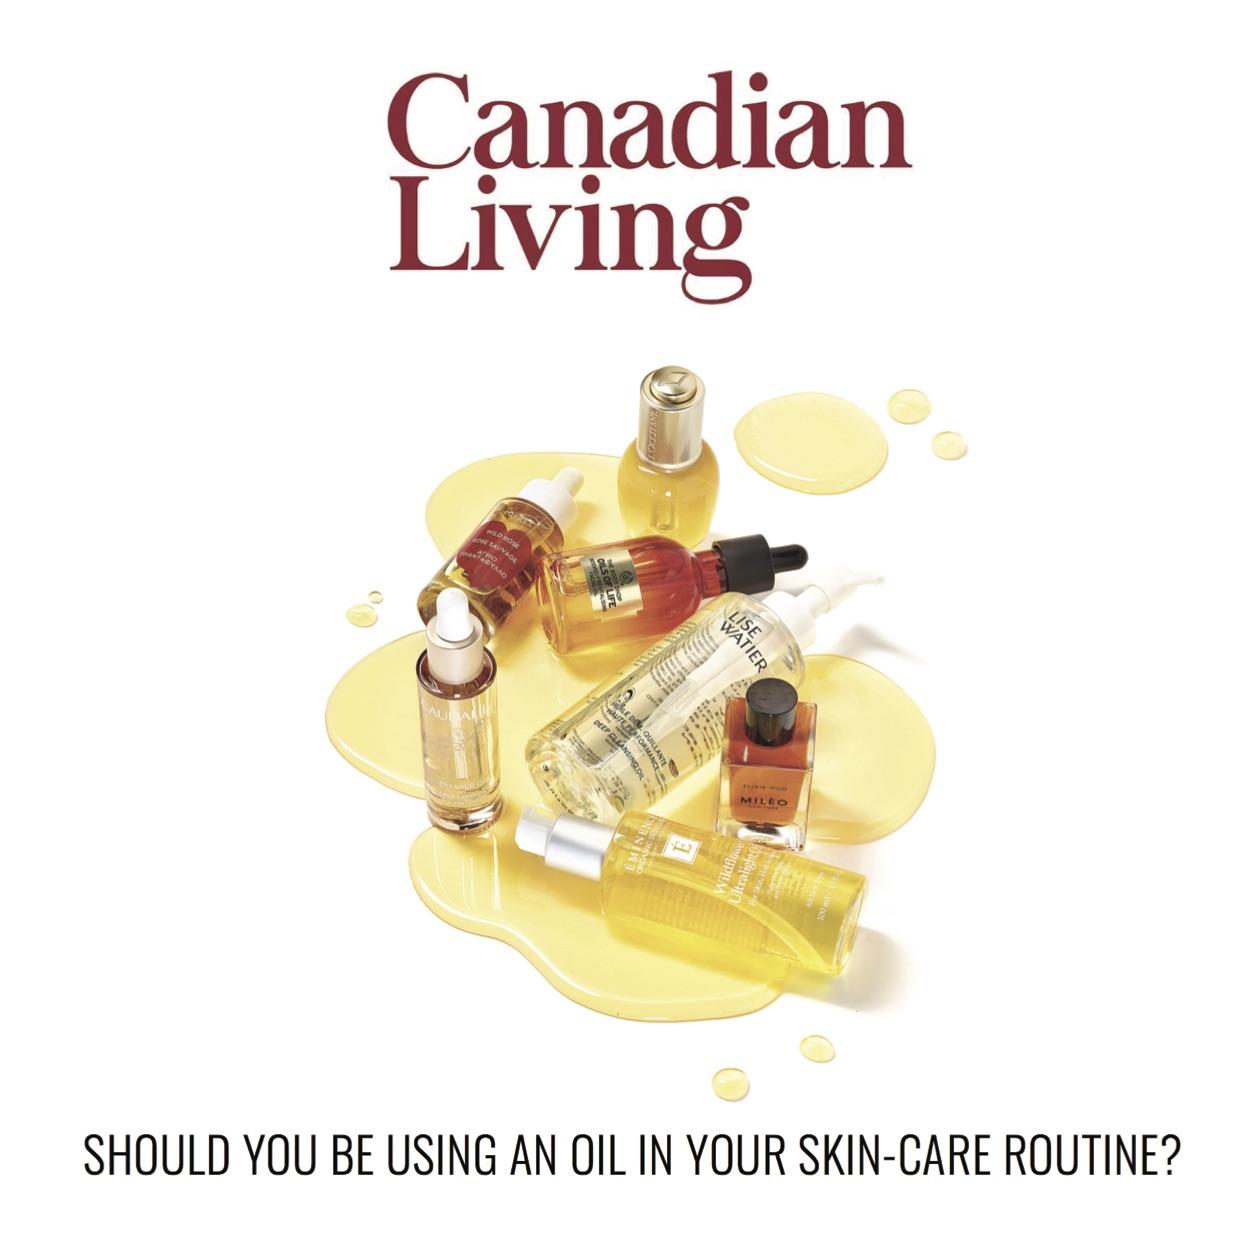 Canadian Living - MILEO - 1.24_STATIC.jpg